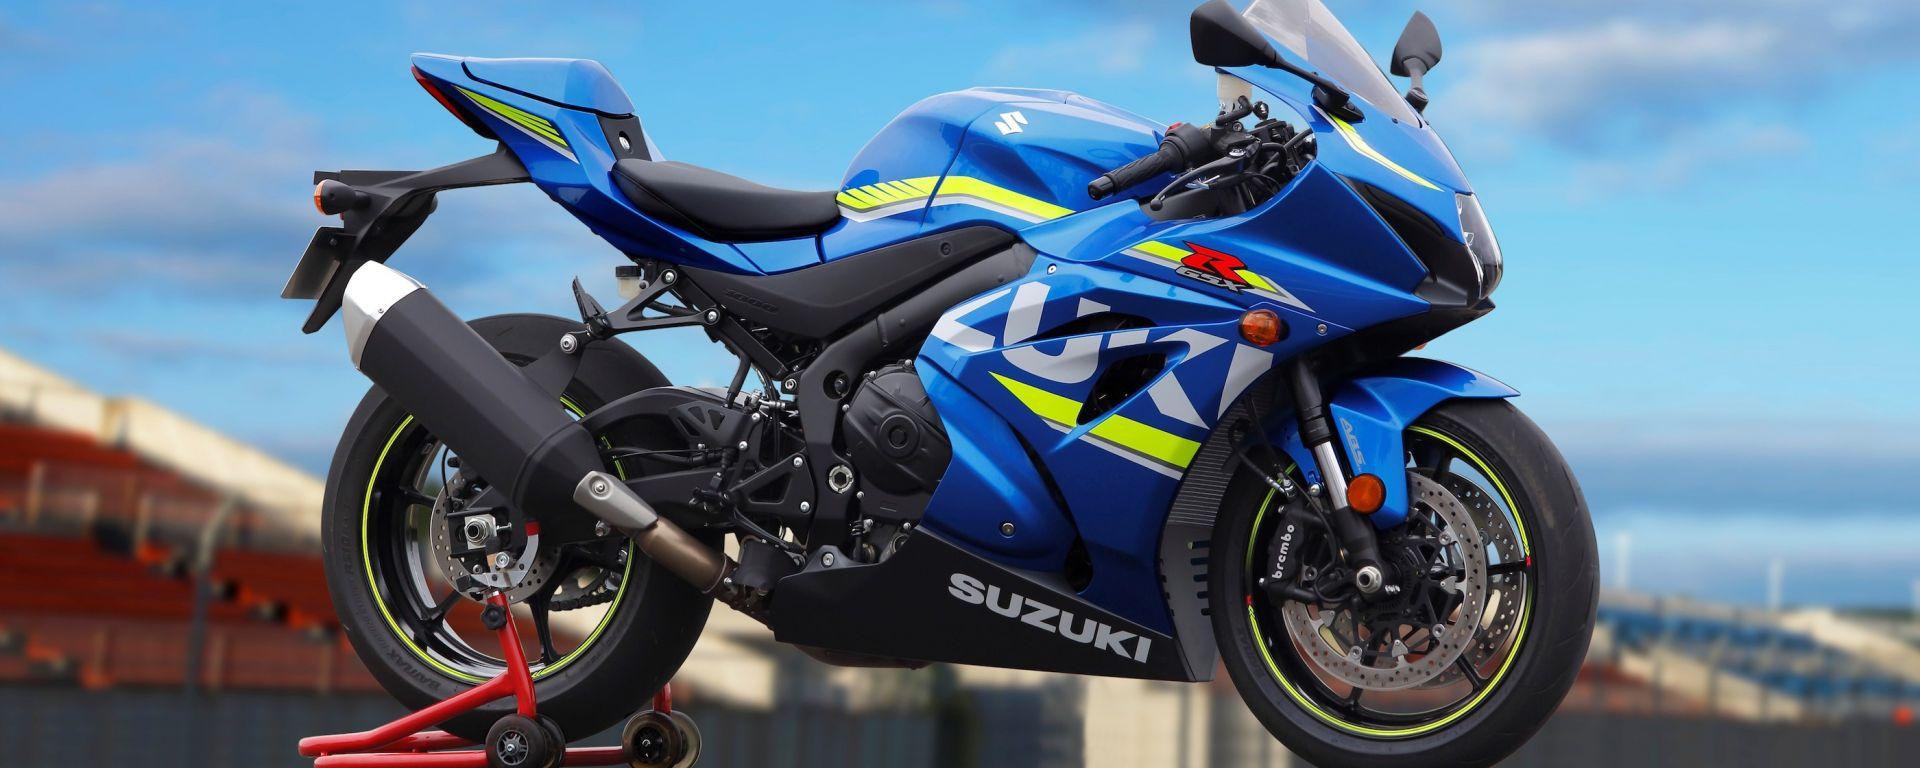 Suzuki a Motodays 2016